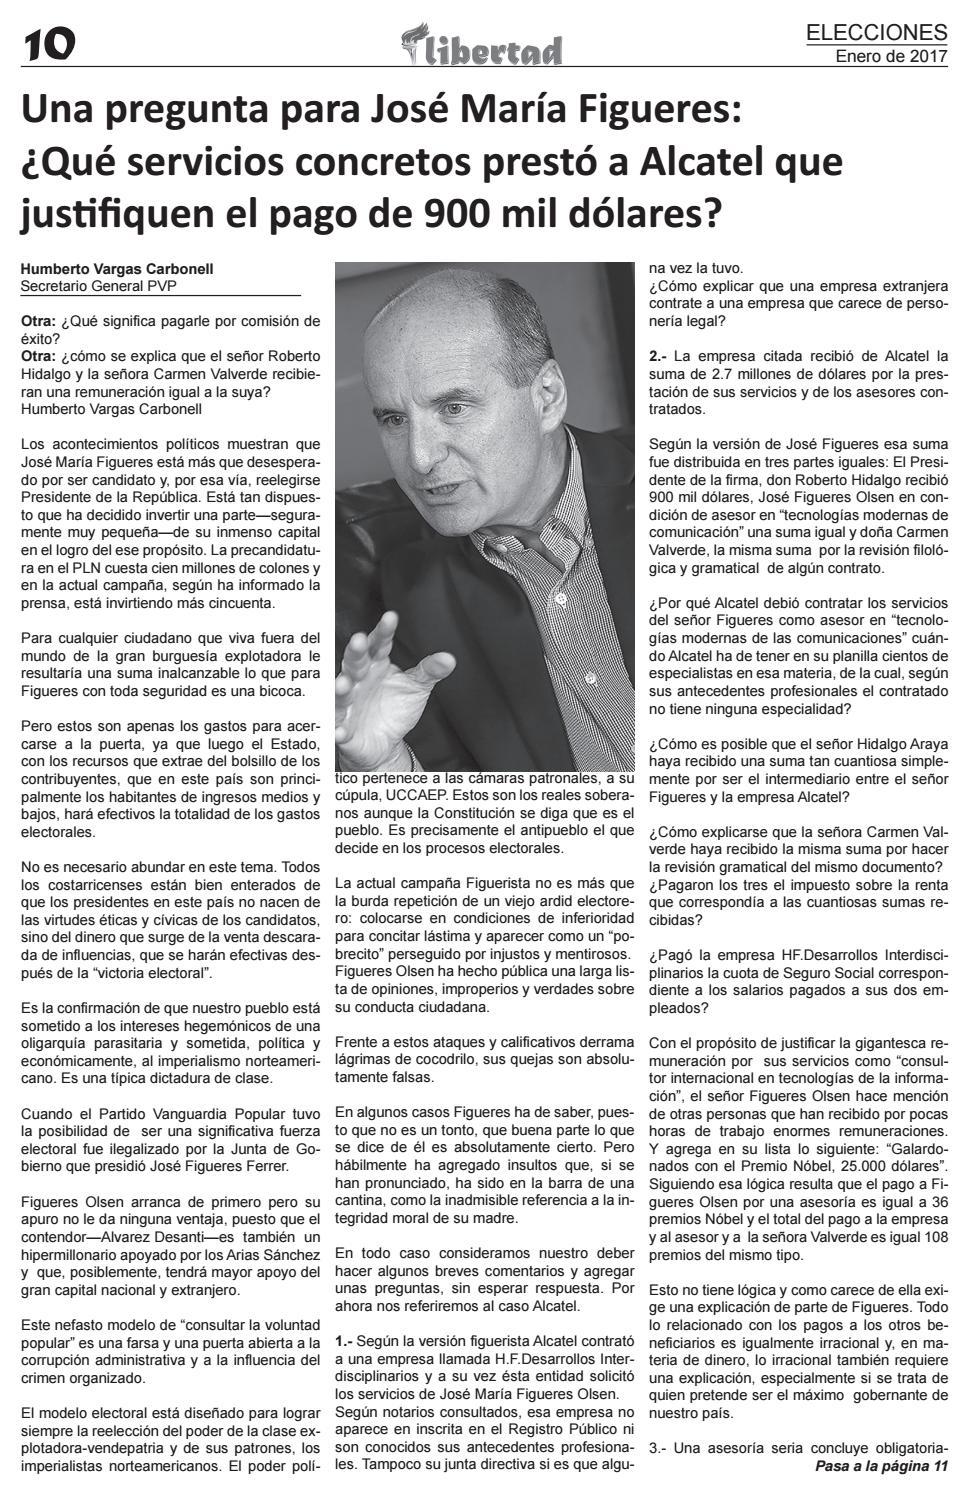 Libertad Edicion 1 by Vanguardia Popular CRC - issuu